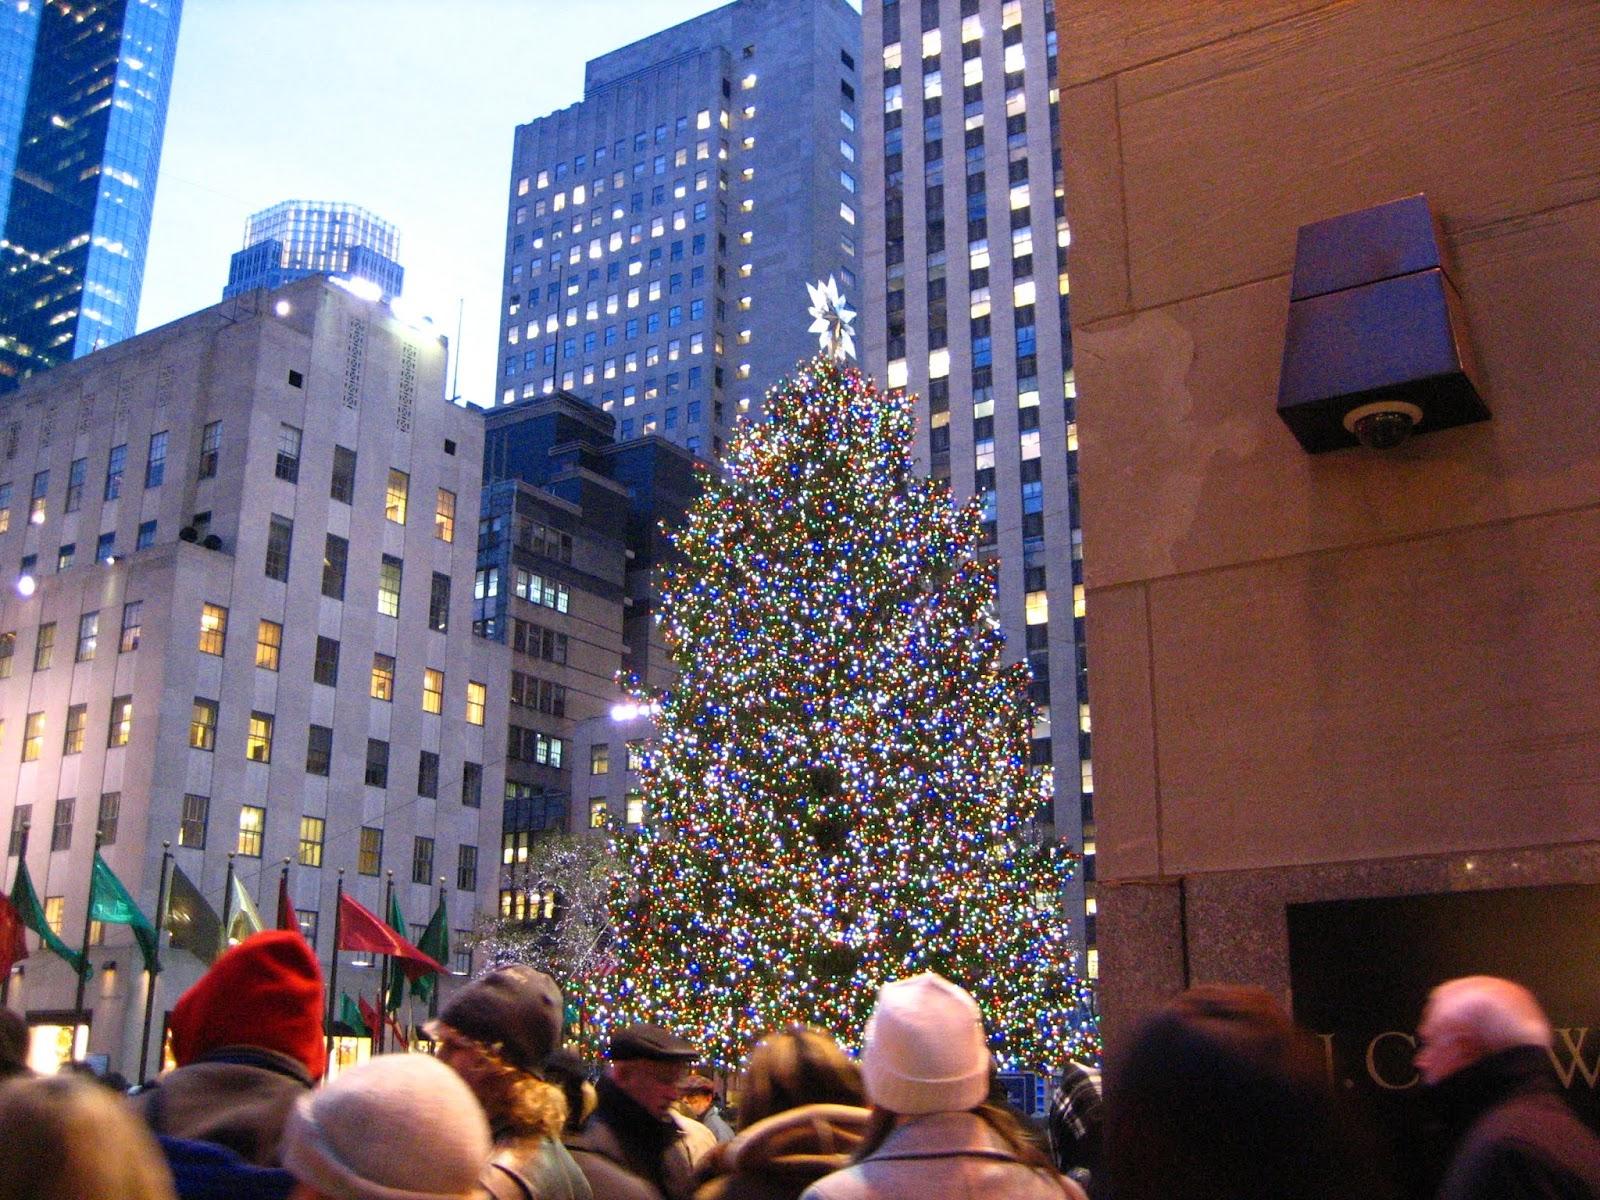 Rockefeller Center-christmastree ロックフェラーセンターのクリスマスツリー